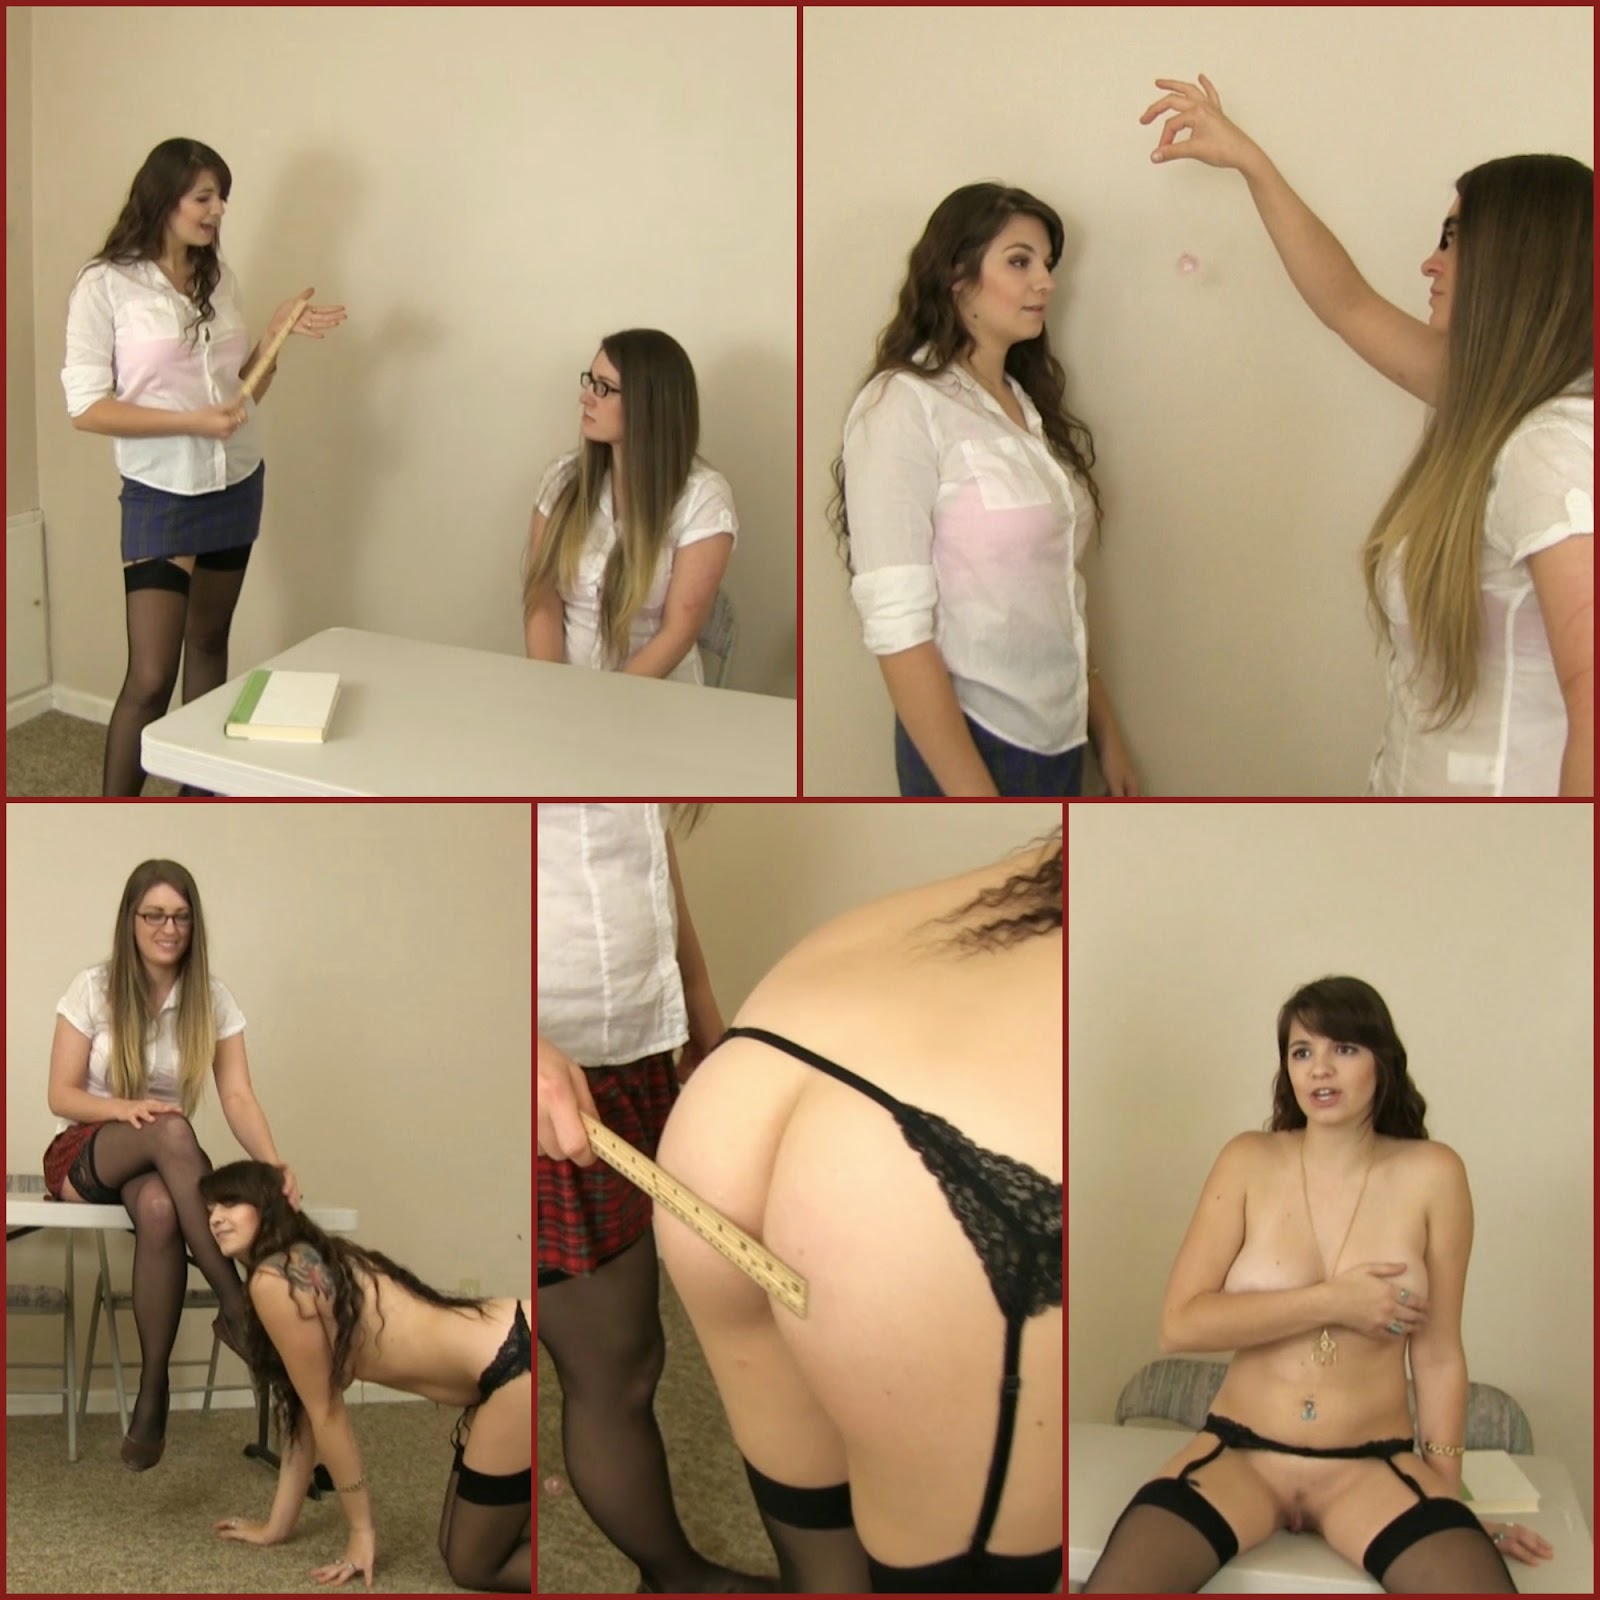 Dare Video Clip Naked Female 111